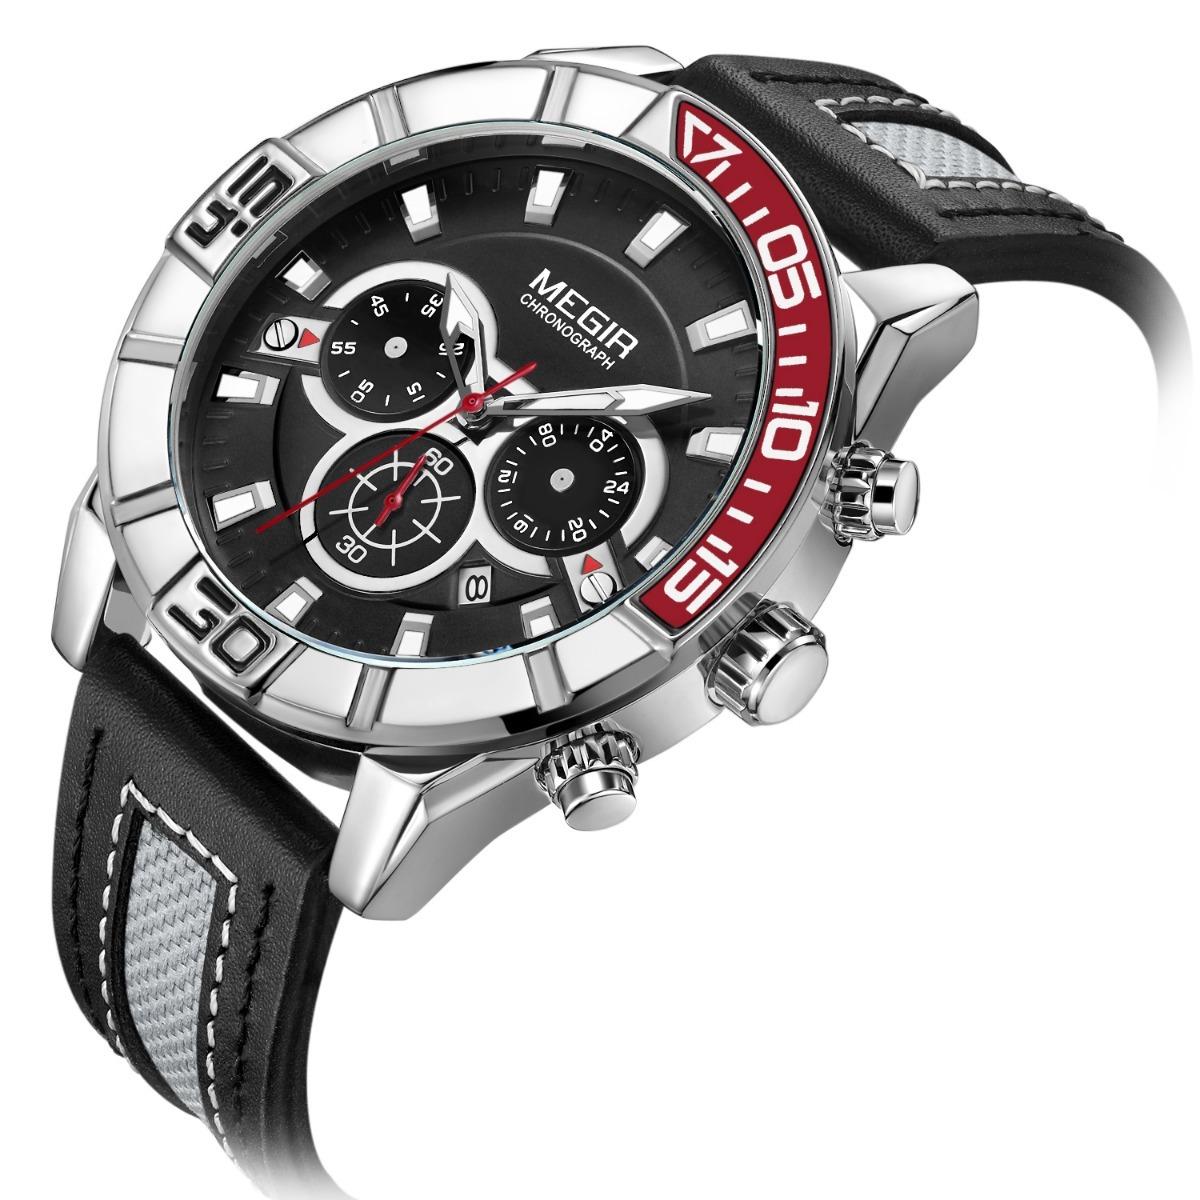 0d7bc54cc120 Reloj Megir Con Cronografo Para Hombre Original -   890.00 en ...